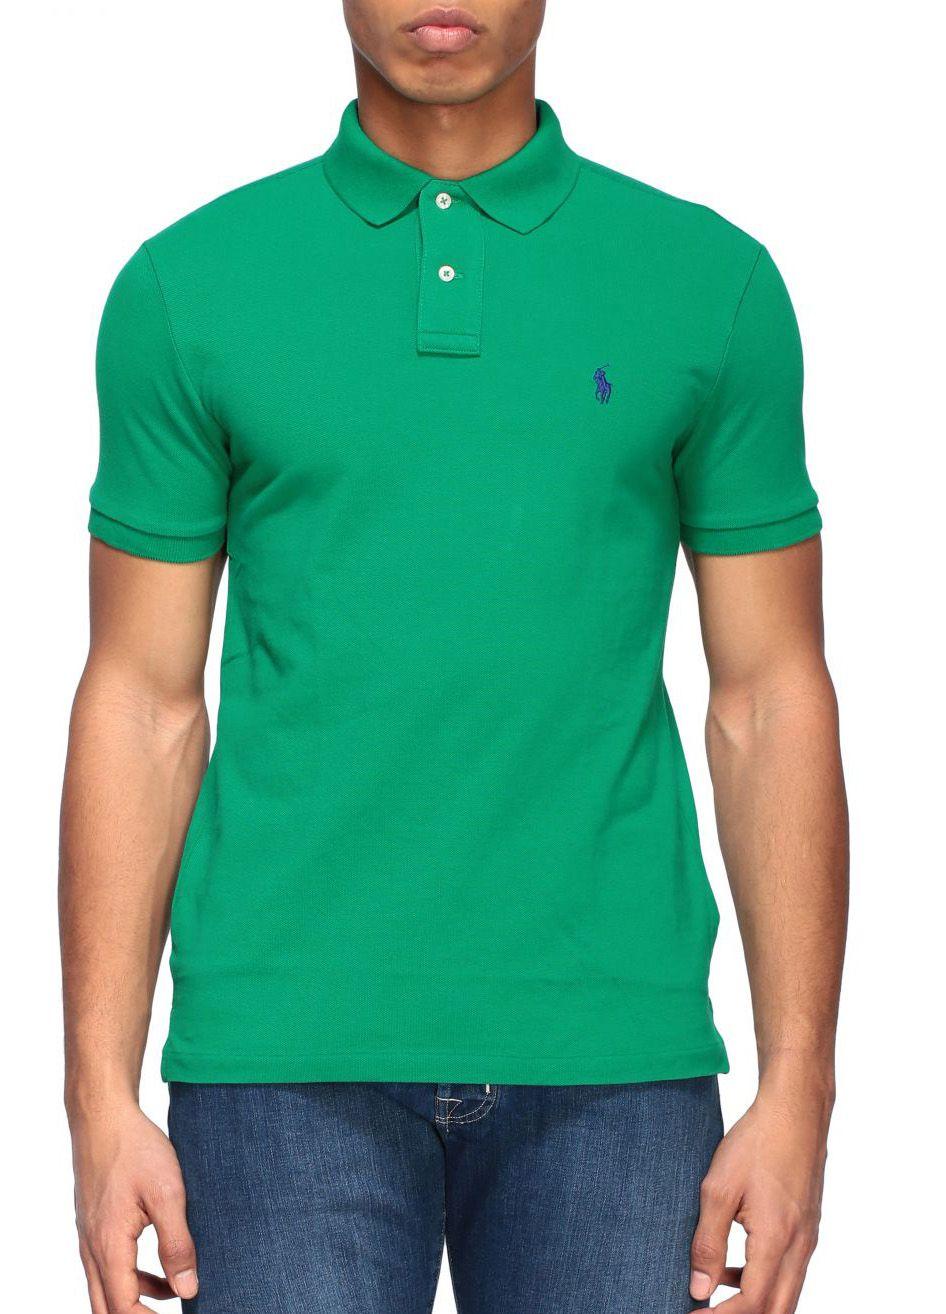 Polo Ralph Lauren Masculina Slim Fit Verde Bordado Logo Roxo